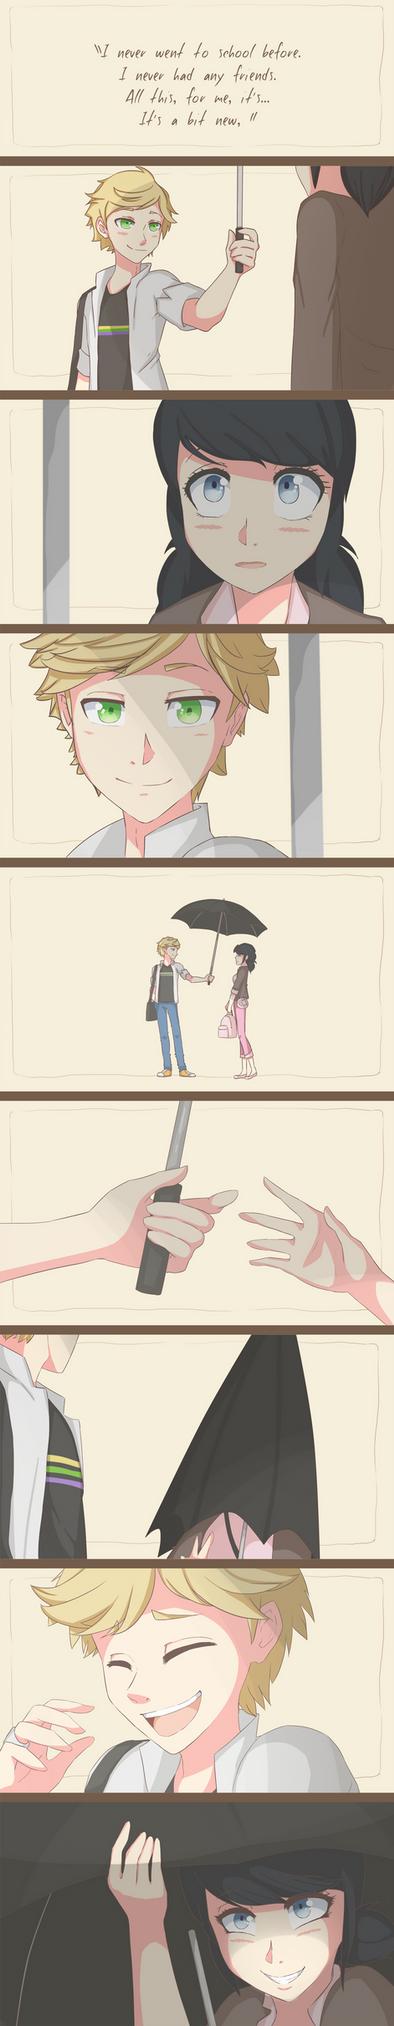 {Miraculous Ladybug} Umbrella Scene by Potates-Chan